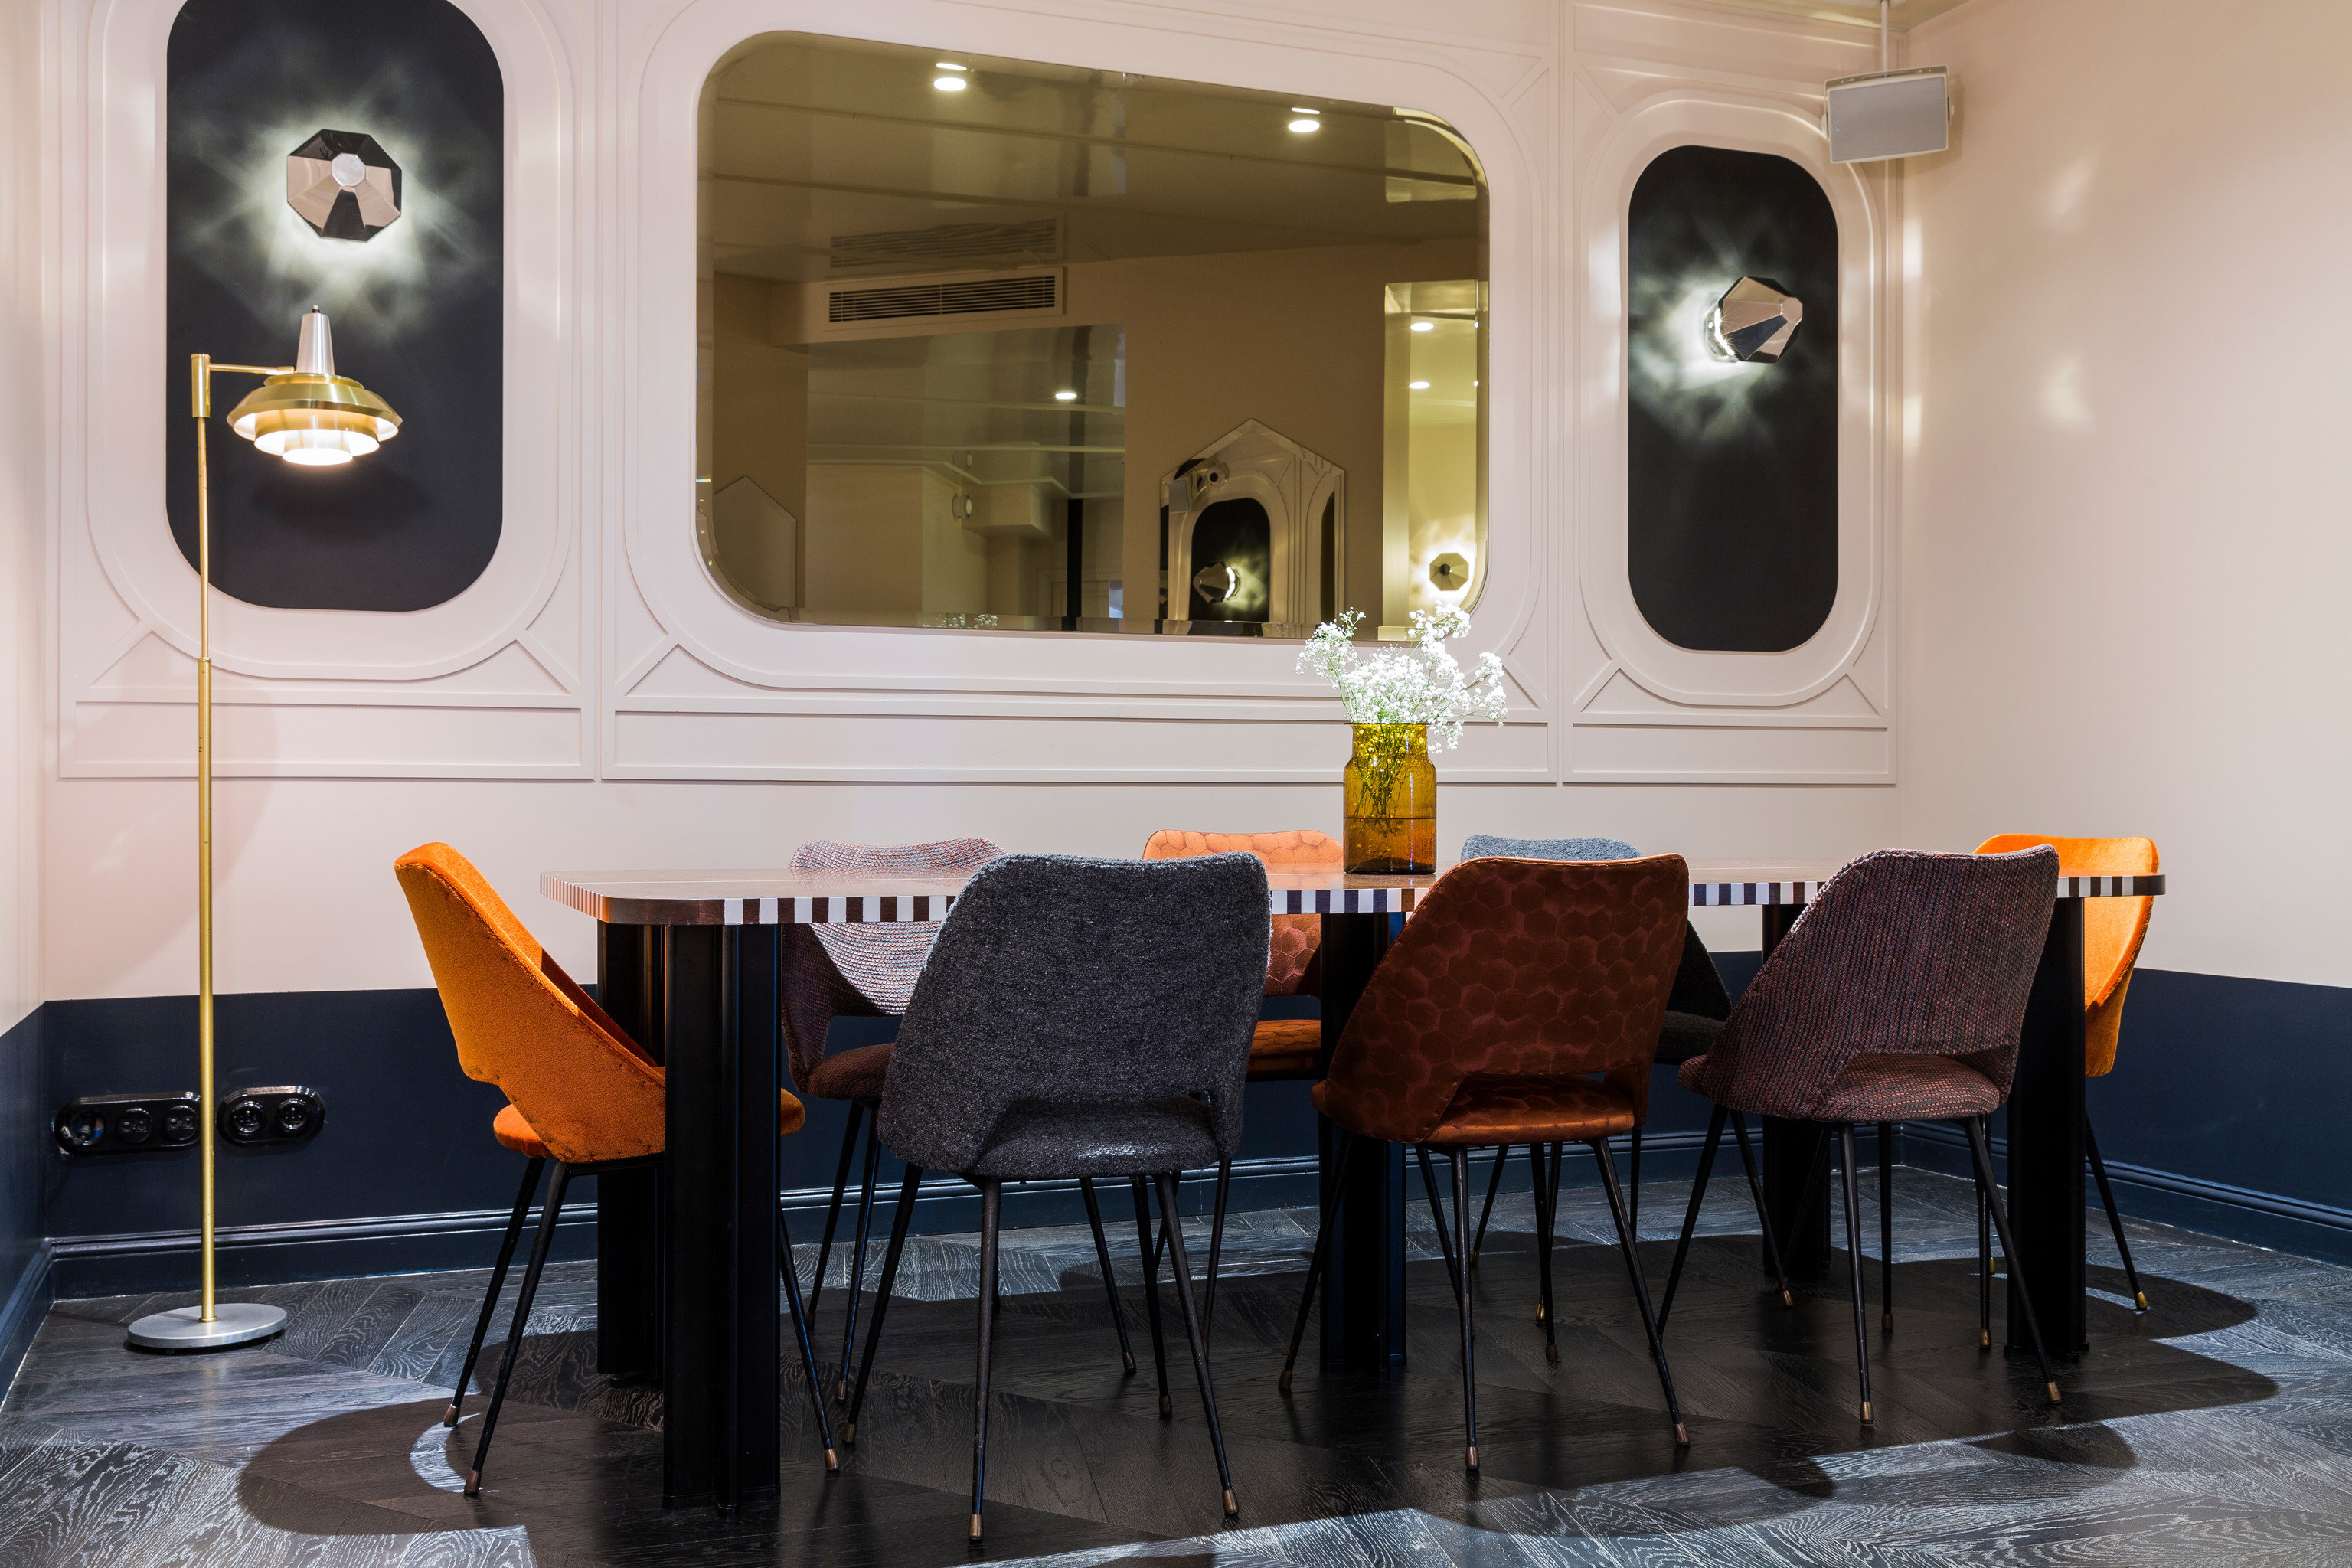 home vehicle living room restaurant